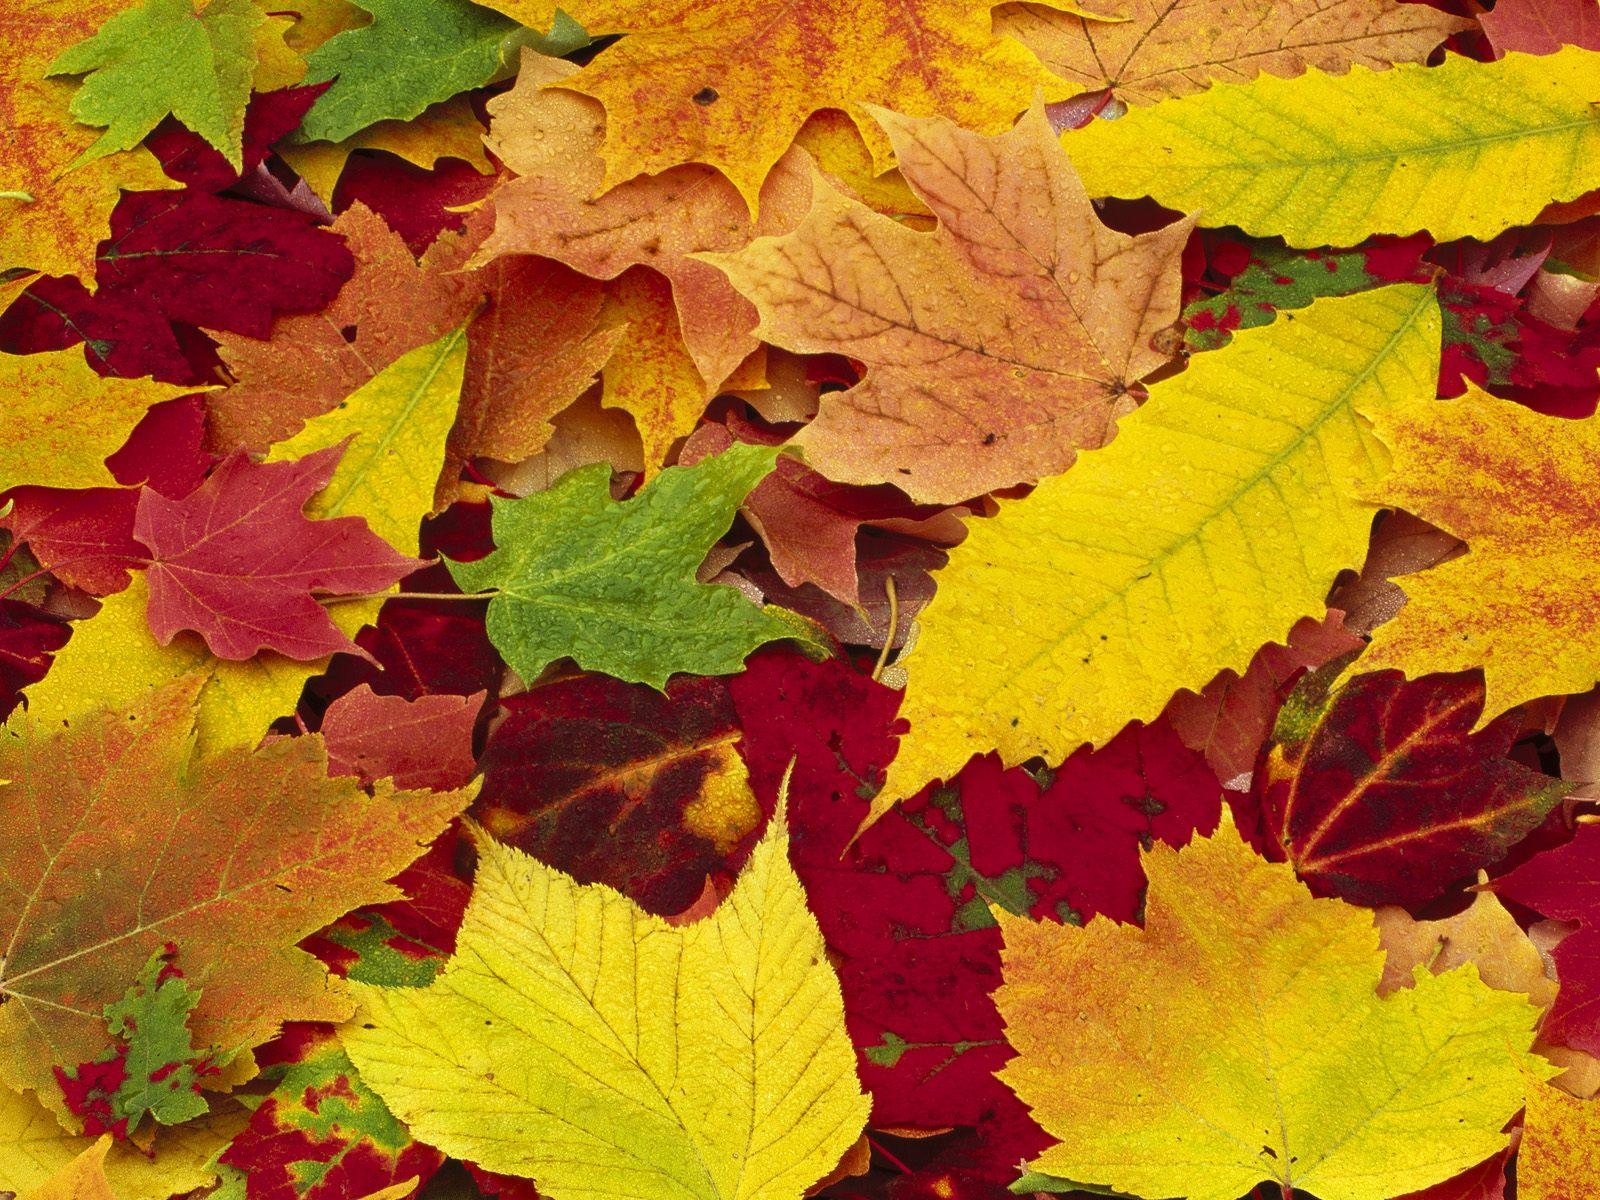 Wallpaper clipart autumn Leaves Leaves  Autumn wallpaper